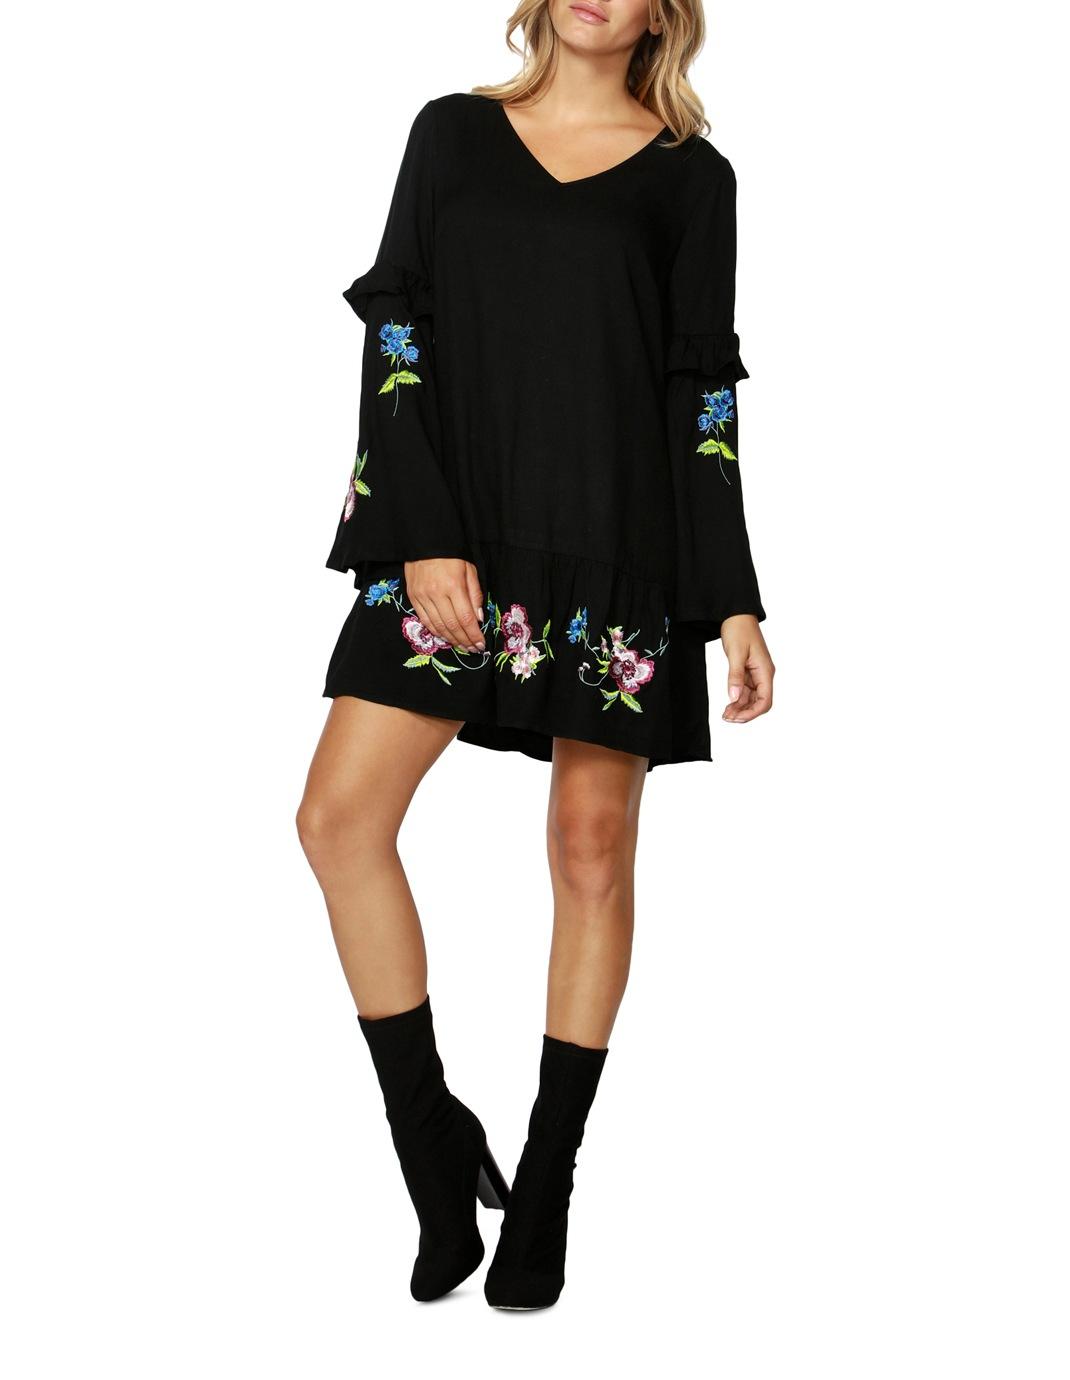 Sass Thalia Embroidered Dress Myer Online Fiction Peplum Purple